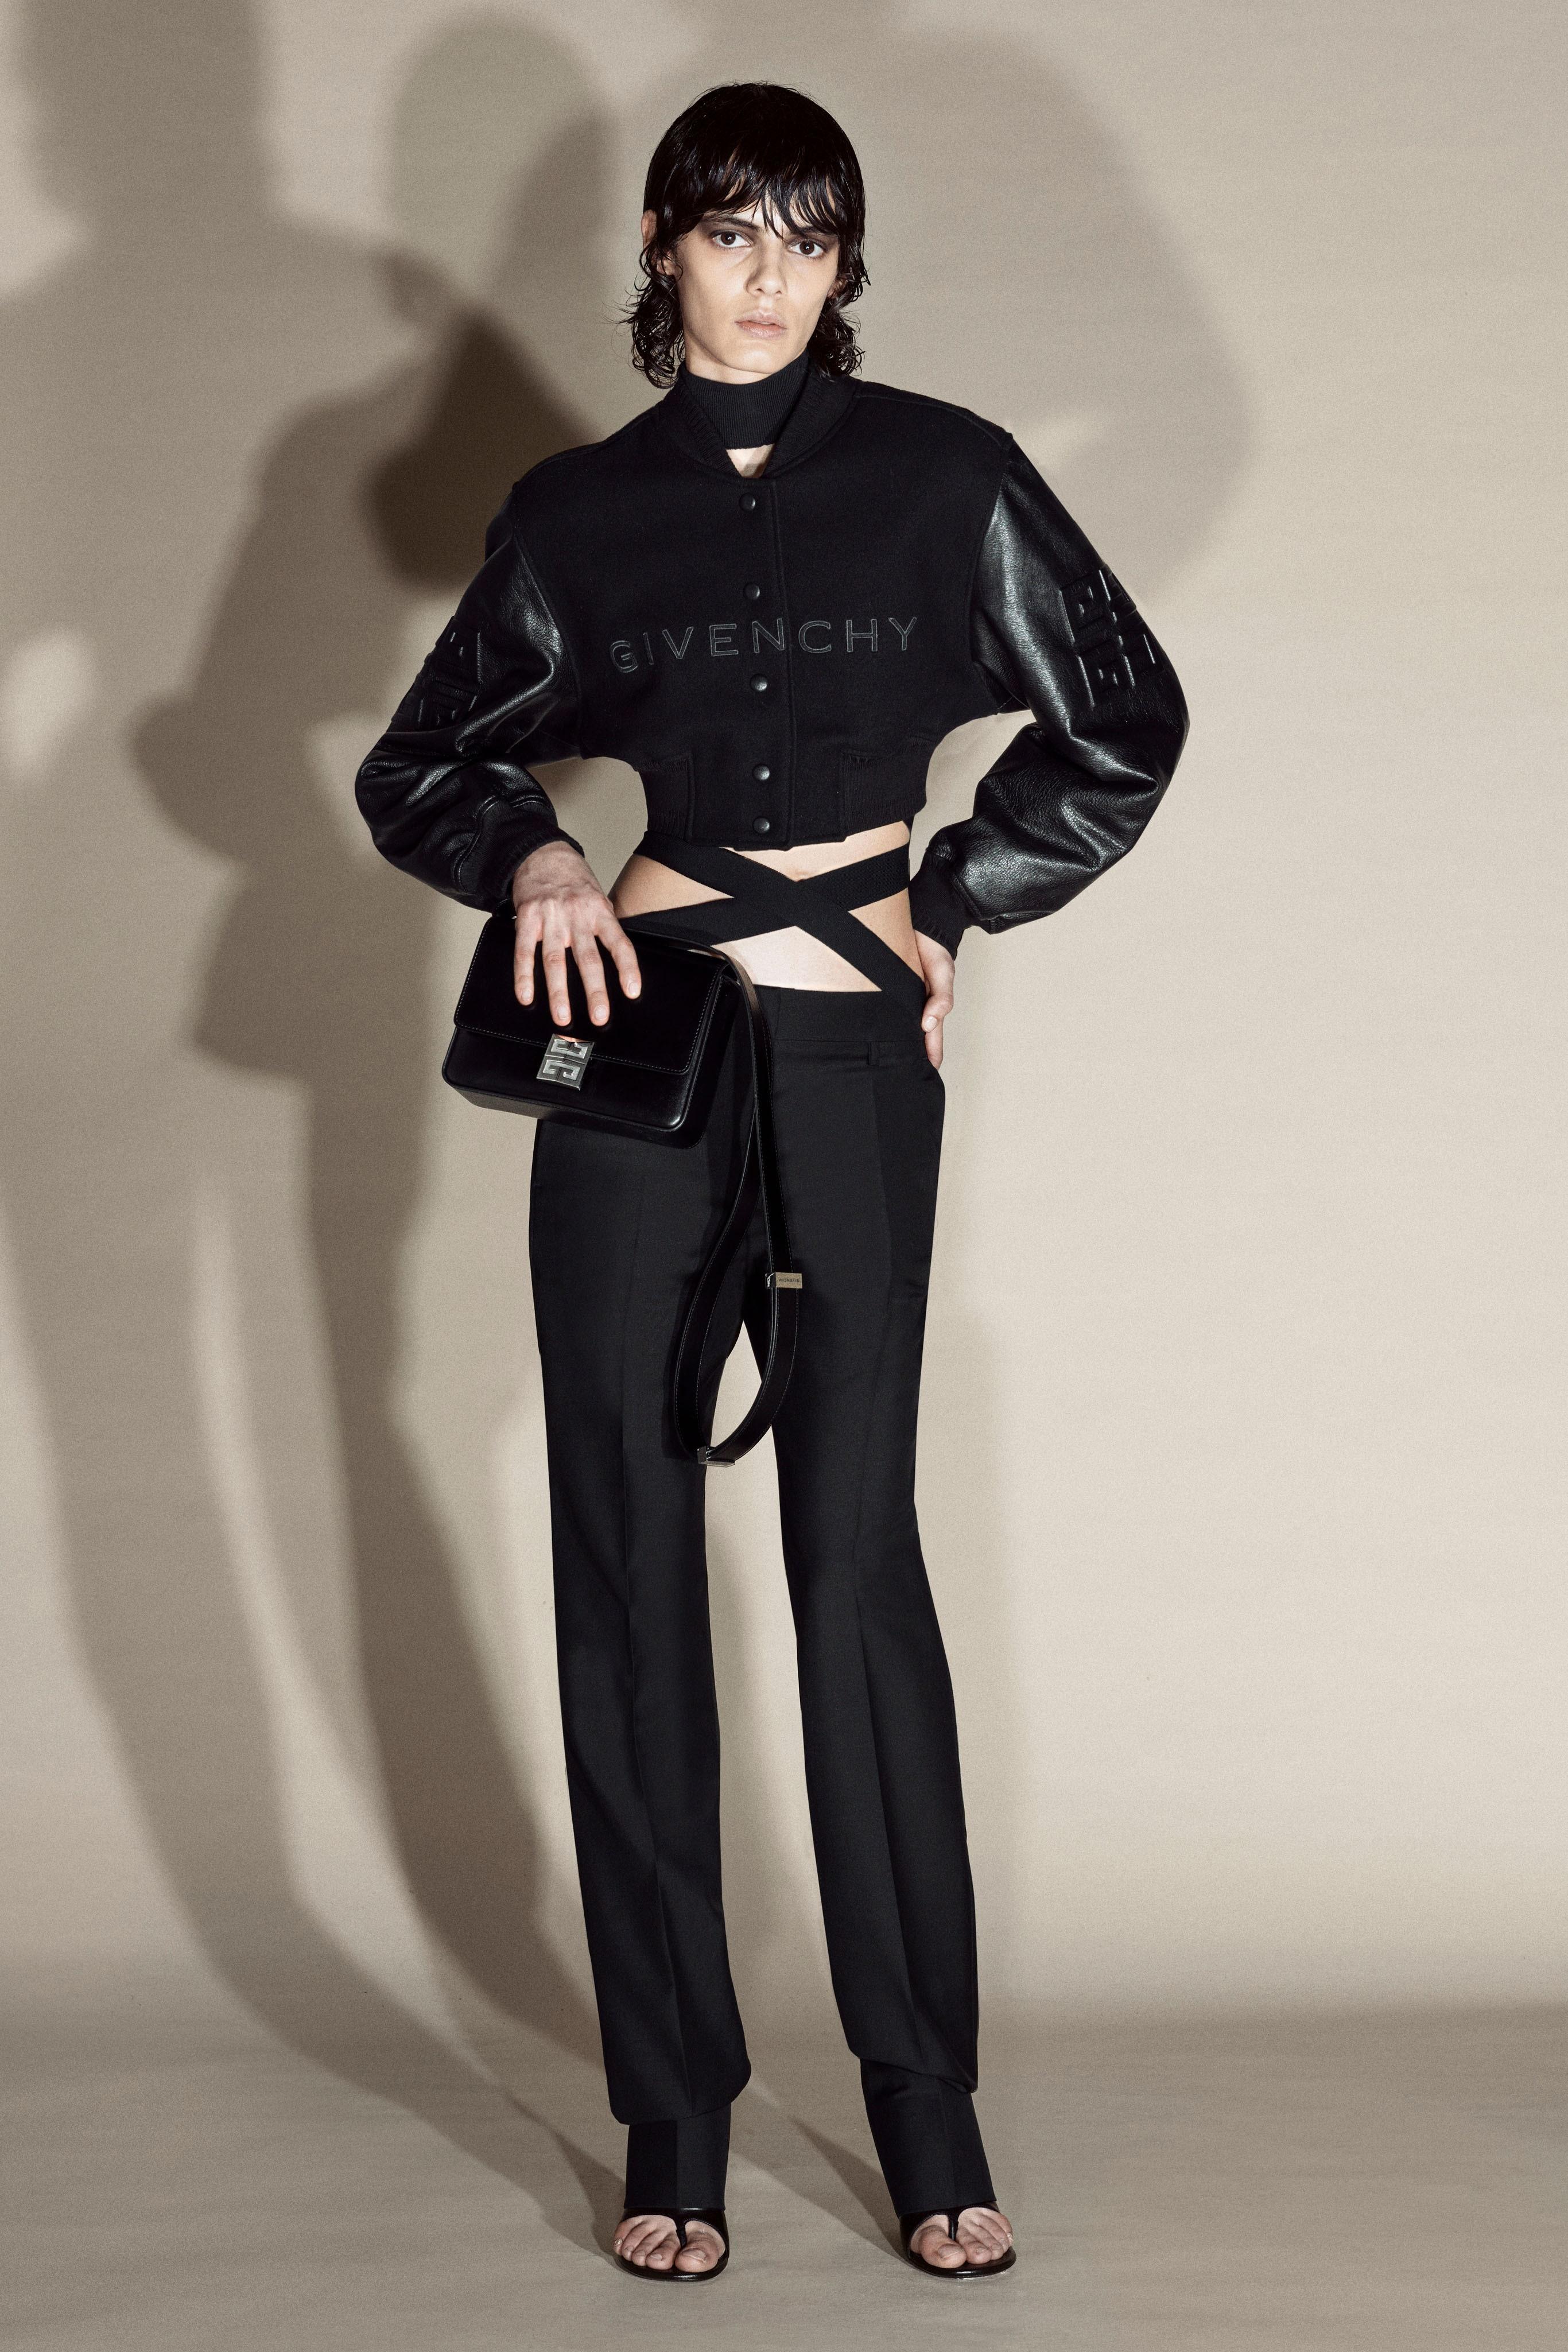 00015-Givenchy-Pre-Fall-21